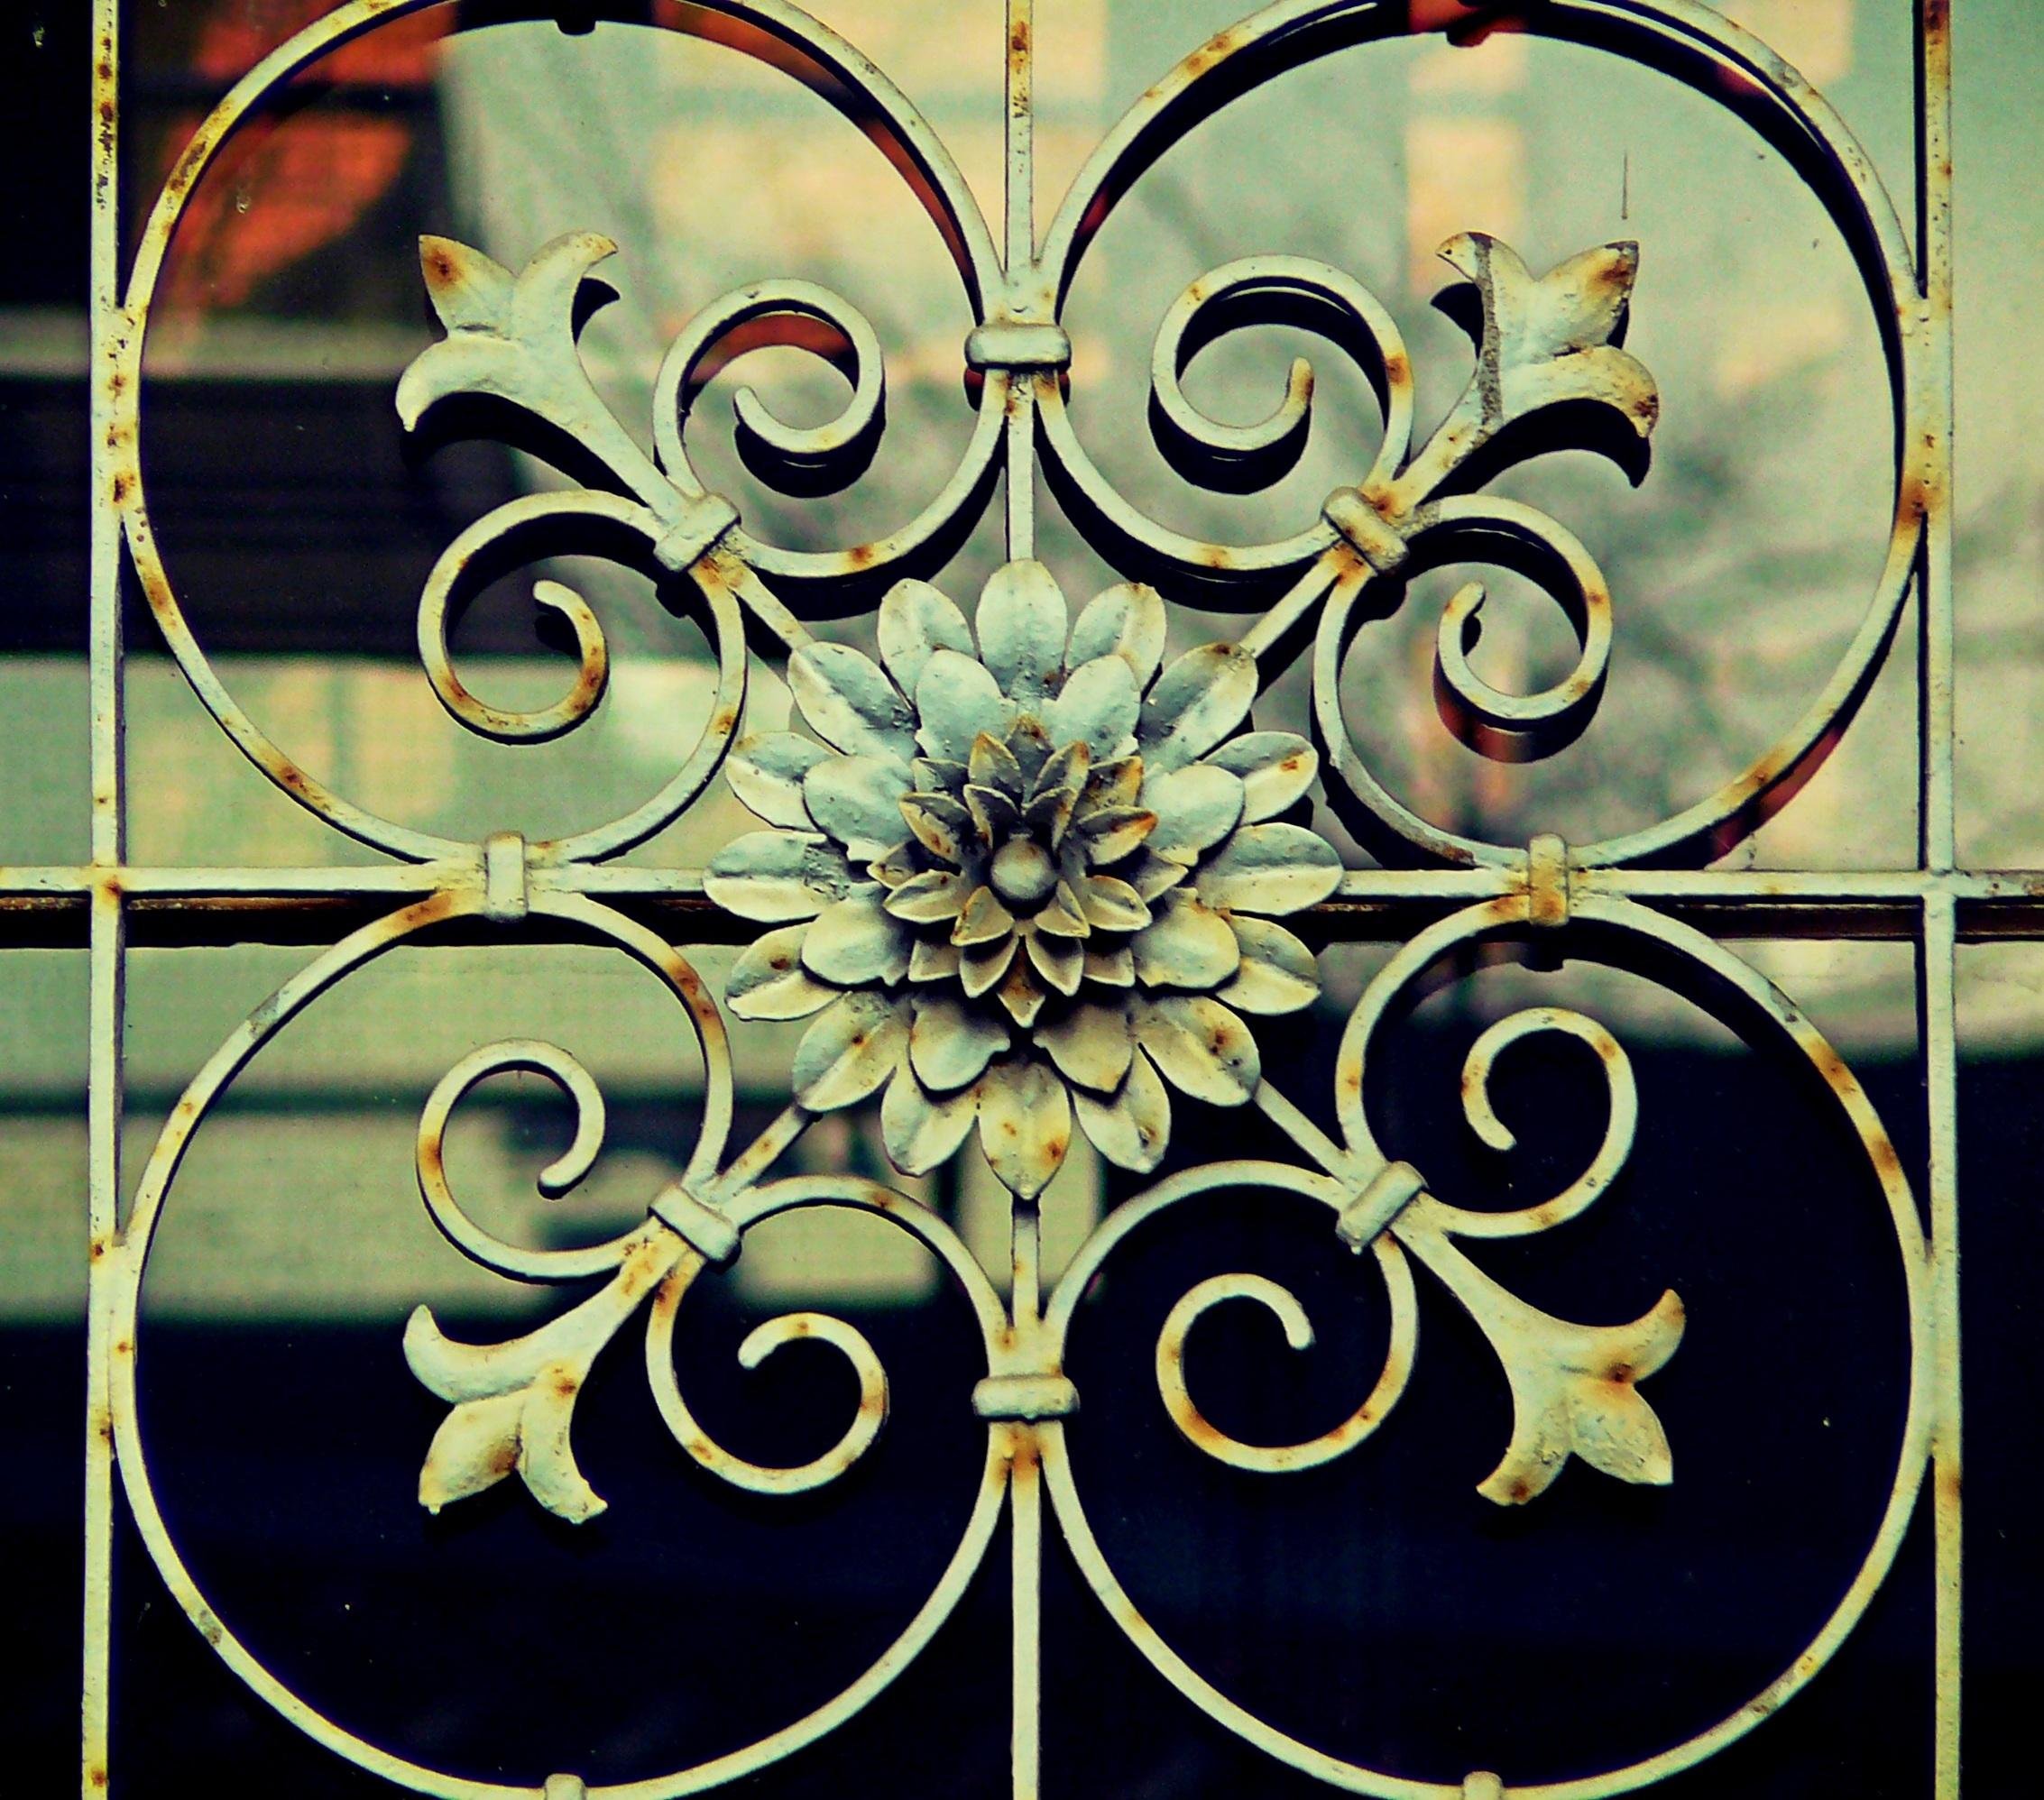 fence-architecture-antique-window-glass-